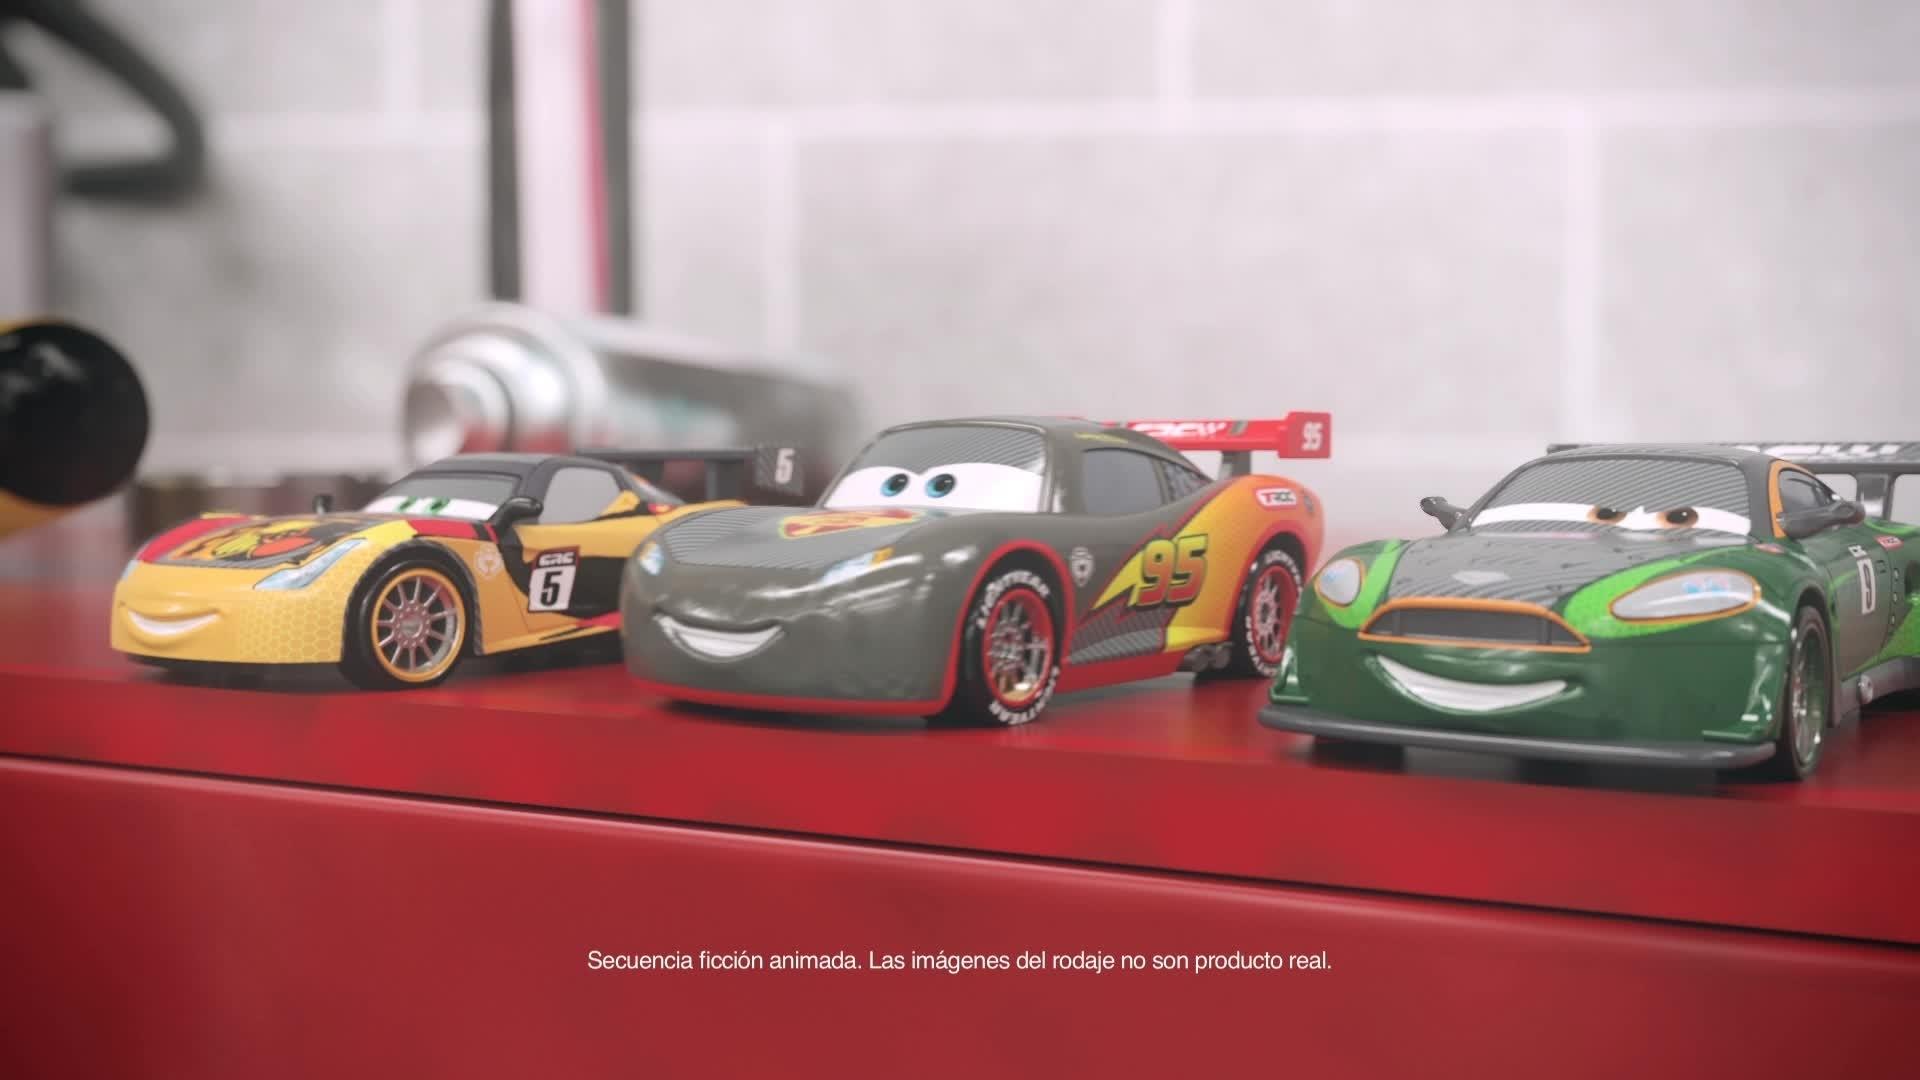 Cars - ddg - the garage